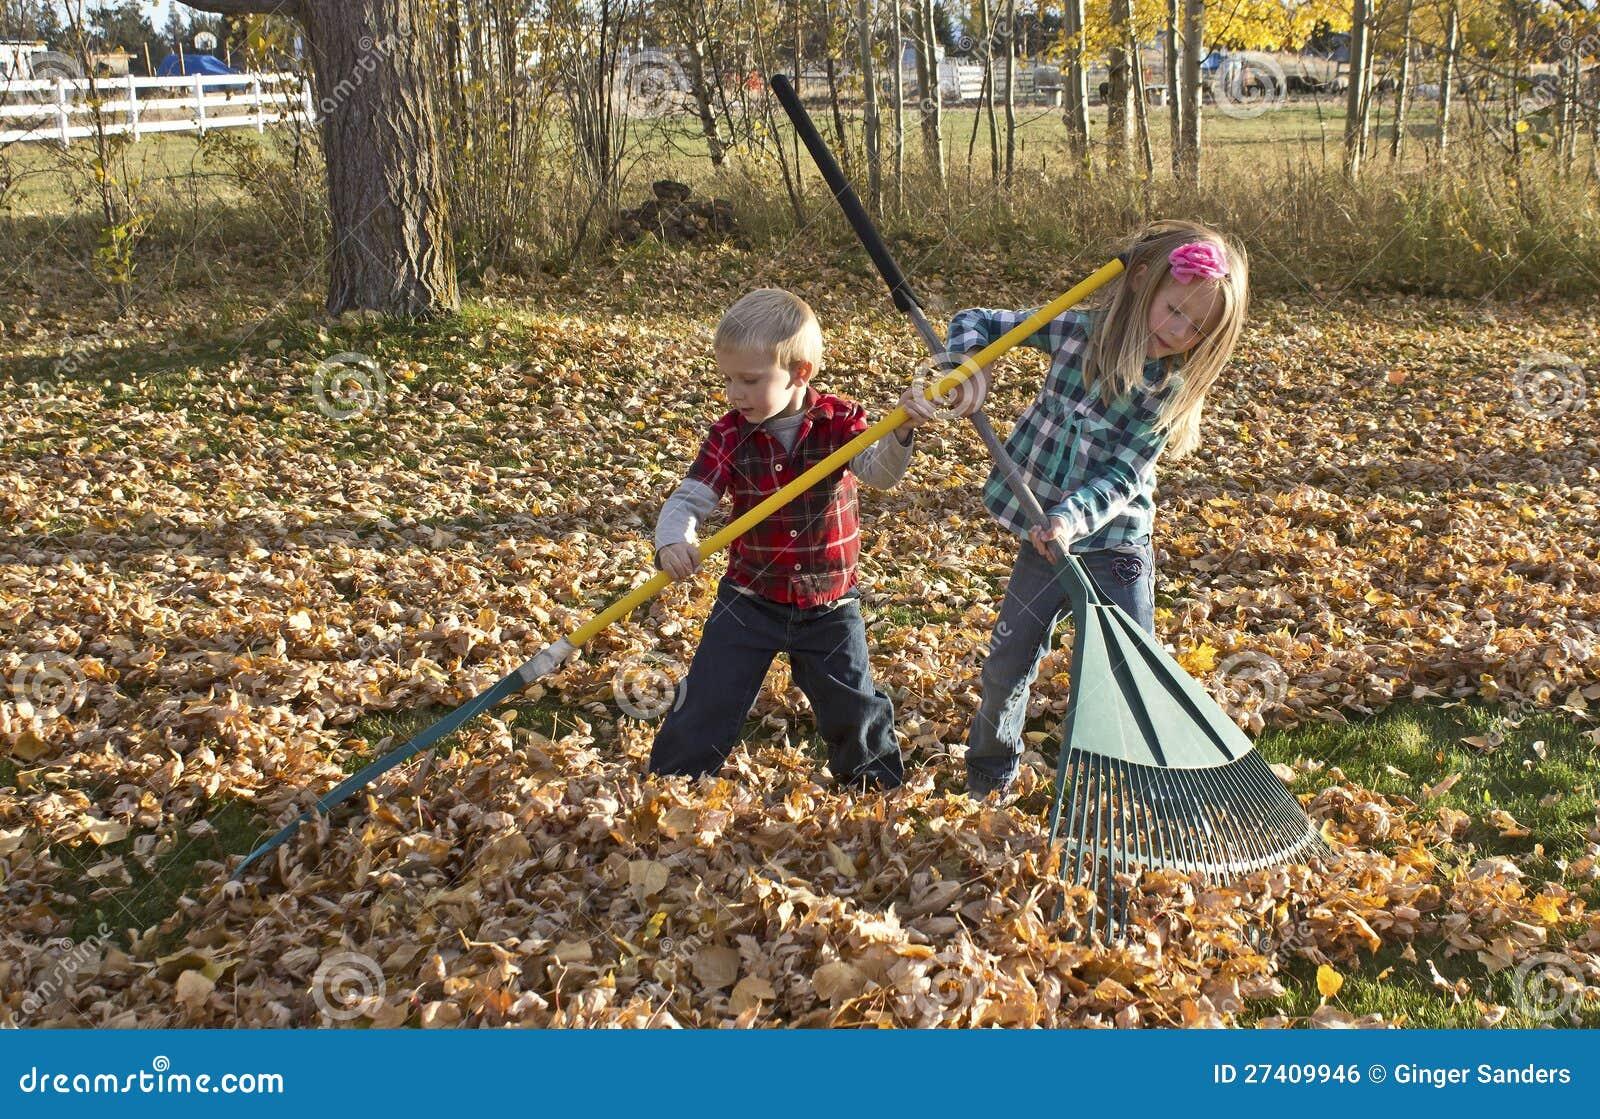 young children raking autumn leaves royalty free stock image